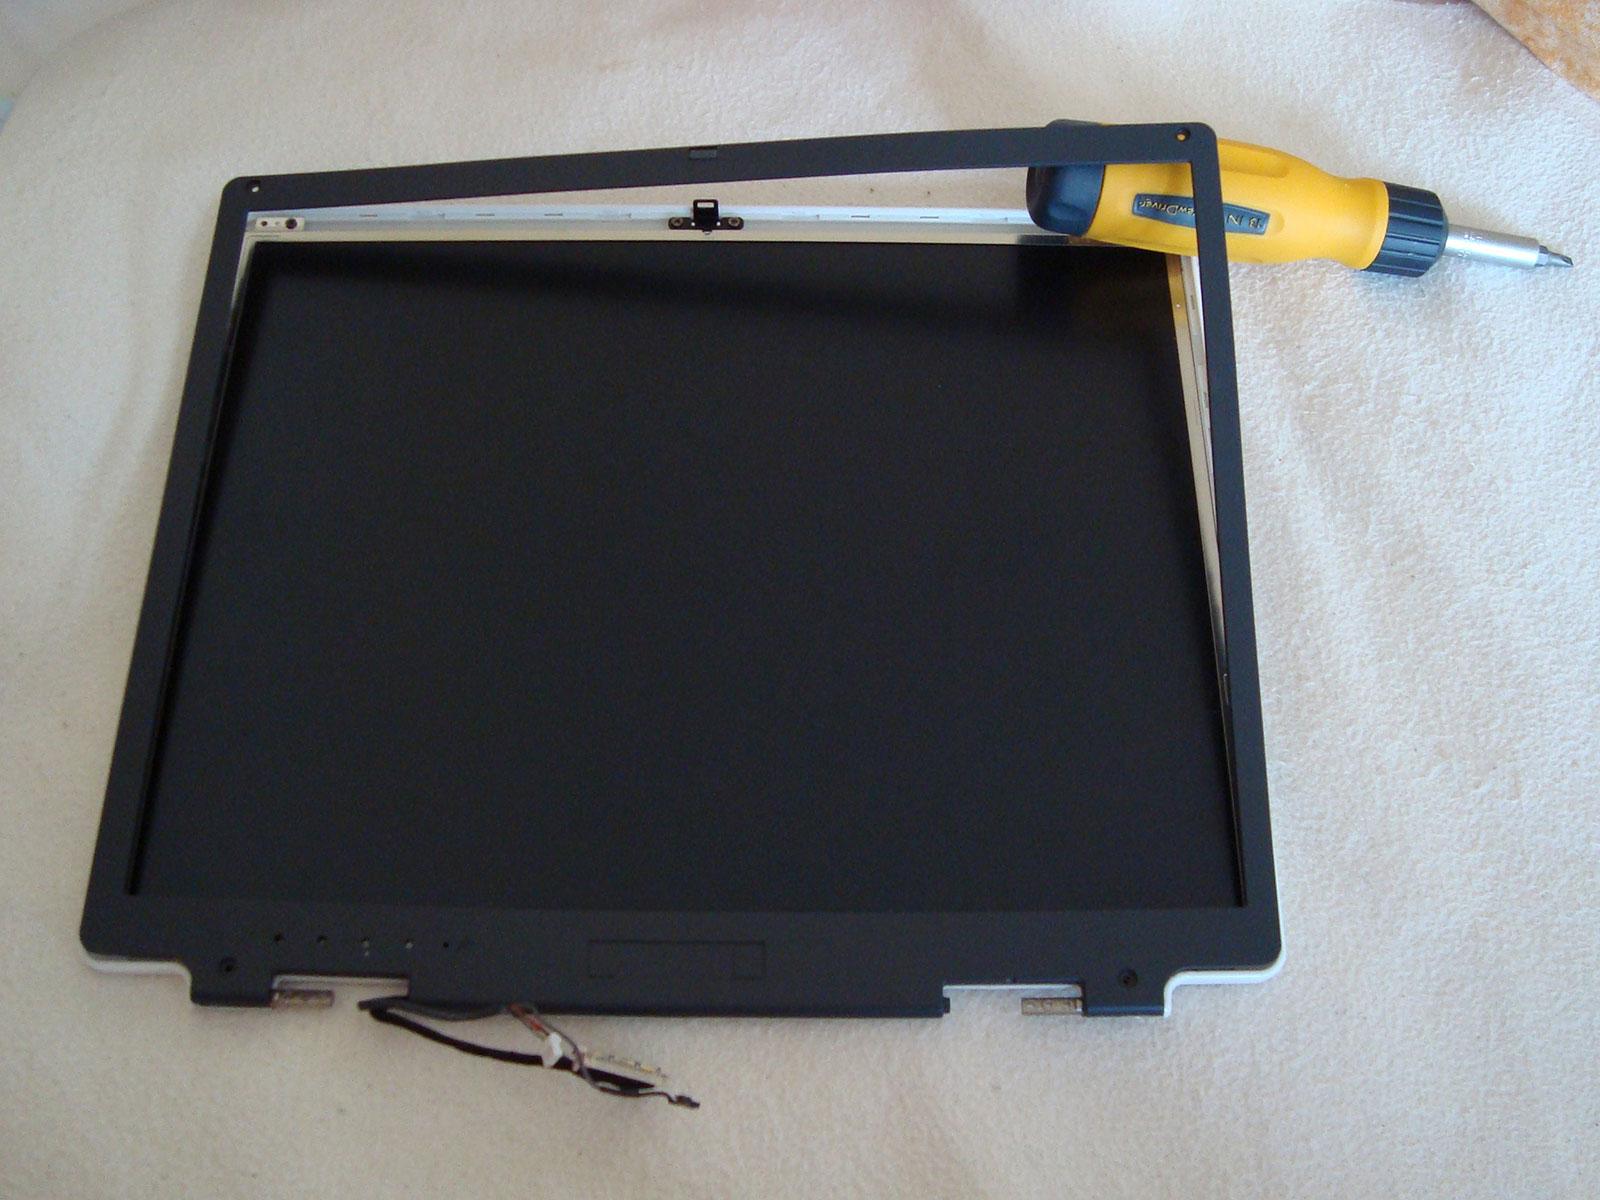 Замена матрицы ноутбука своими руками фото